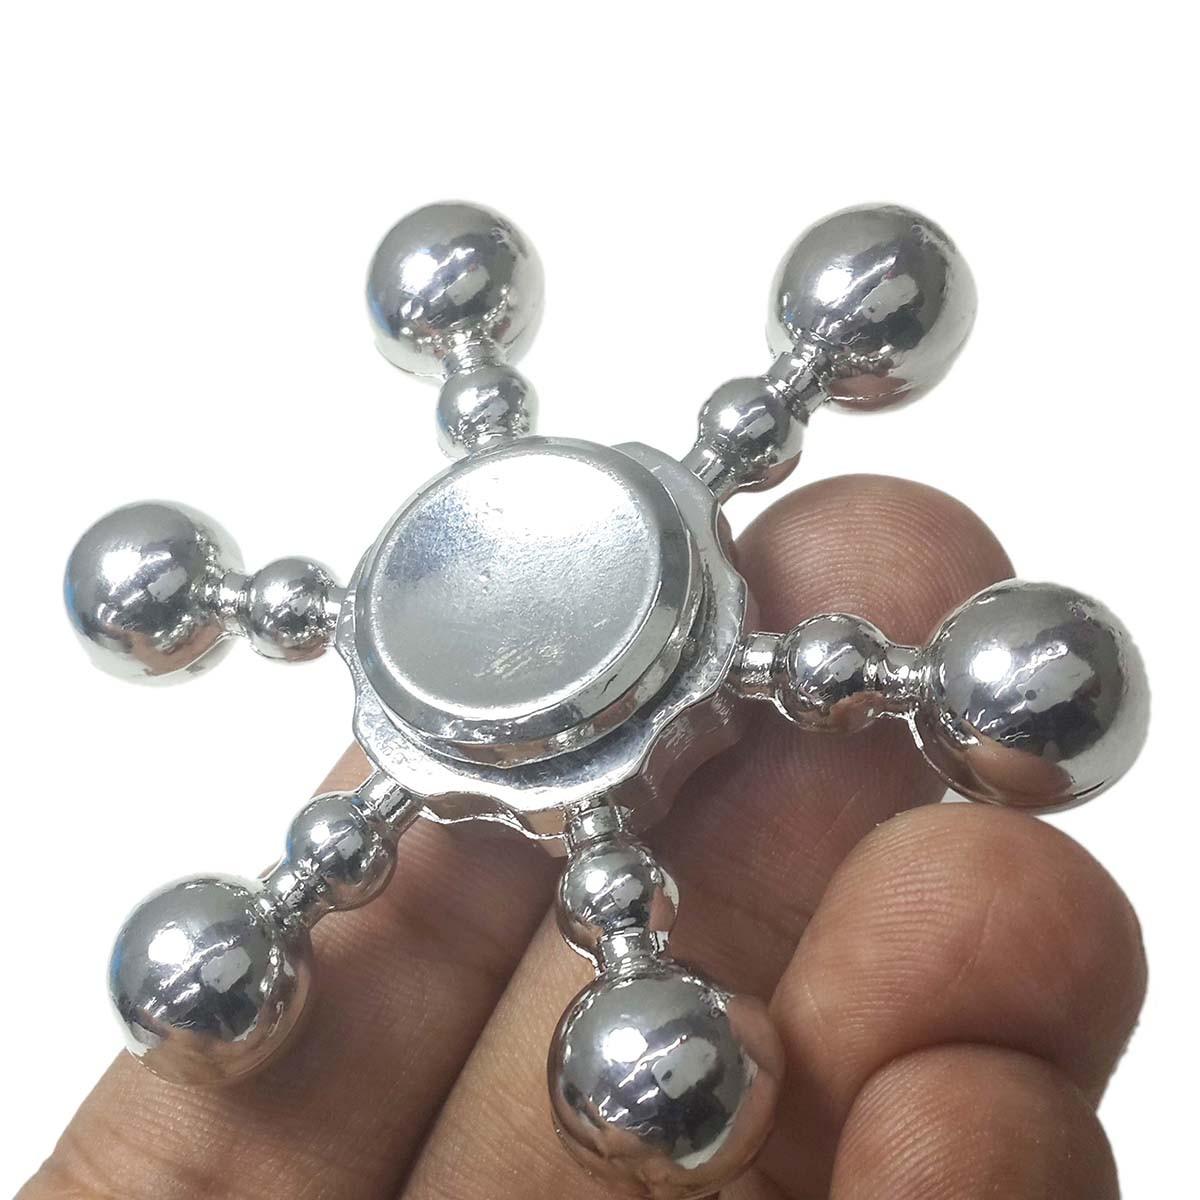 Hand Spinner Fidget De Leme Ansiedade Estresse Metal Prata (BSL-GIRA-10)